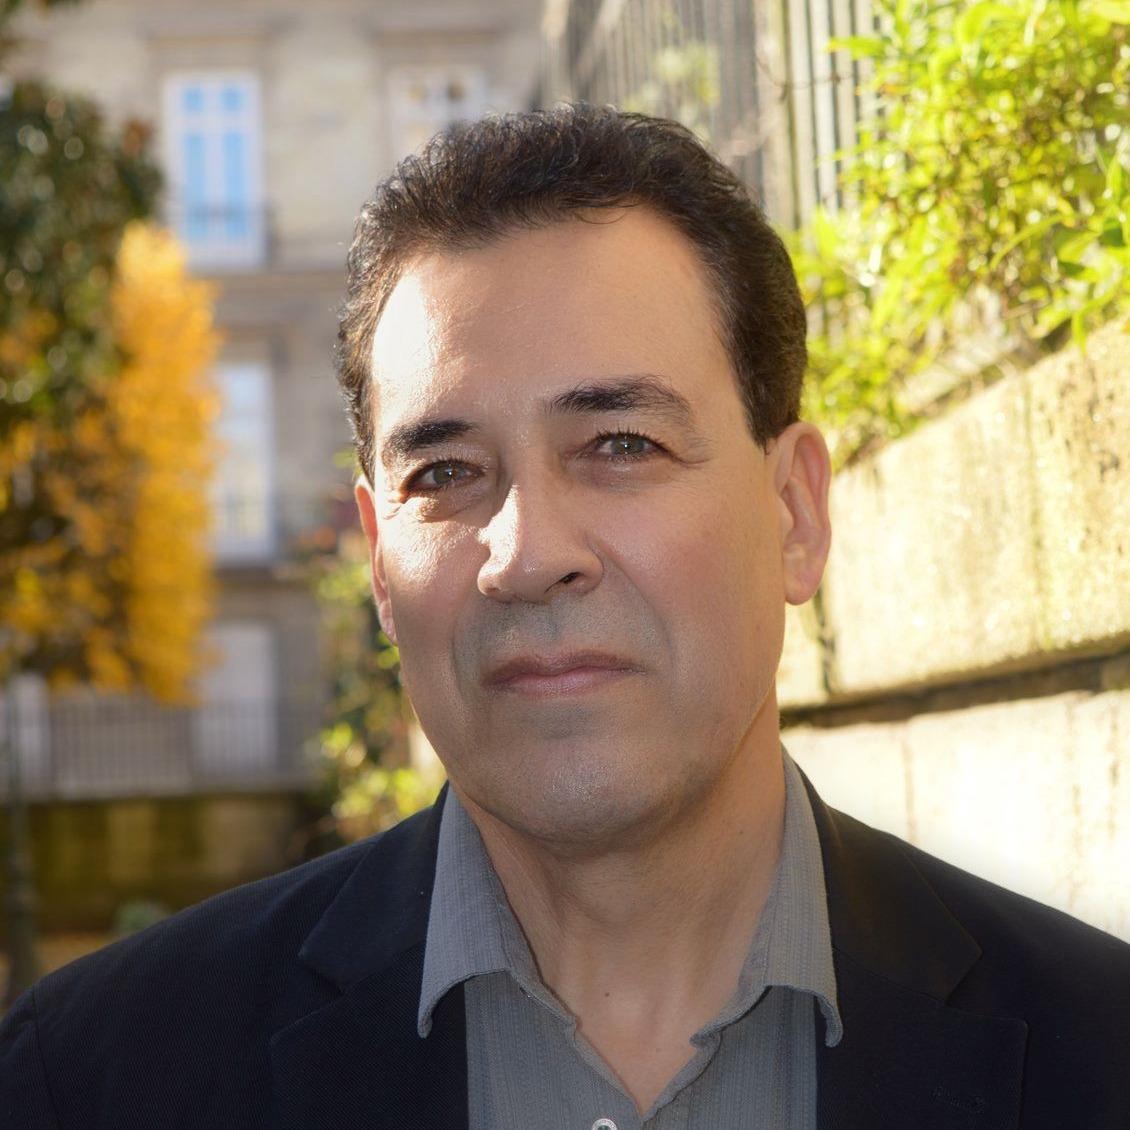 Salah El Moncef